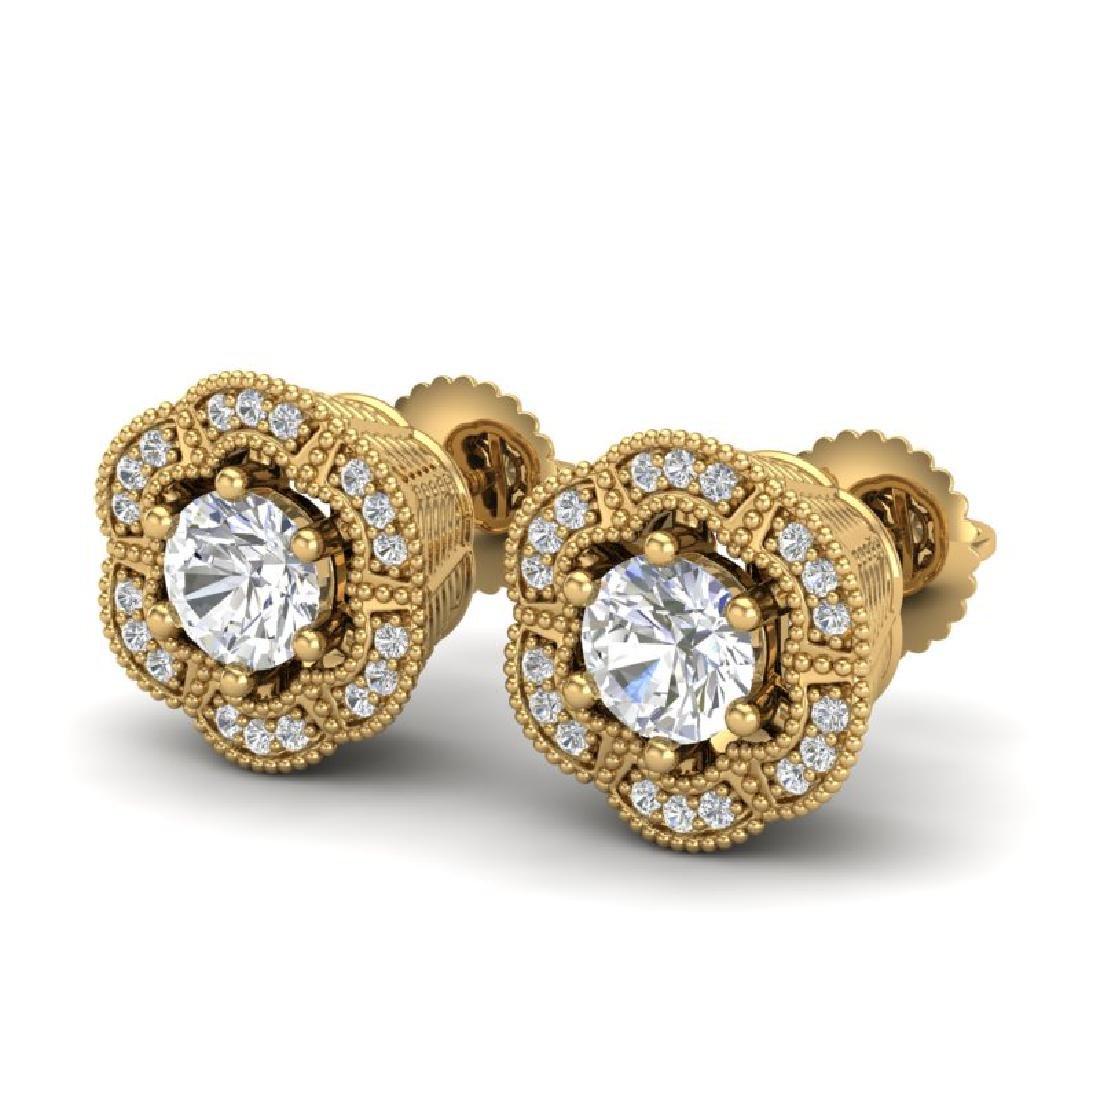 1.51 CTW VS/SI Diamond Solitaire Art Deco Stud Earrings